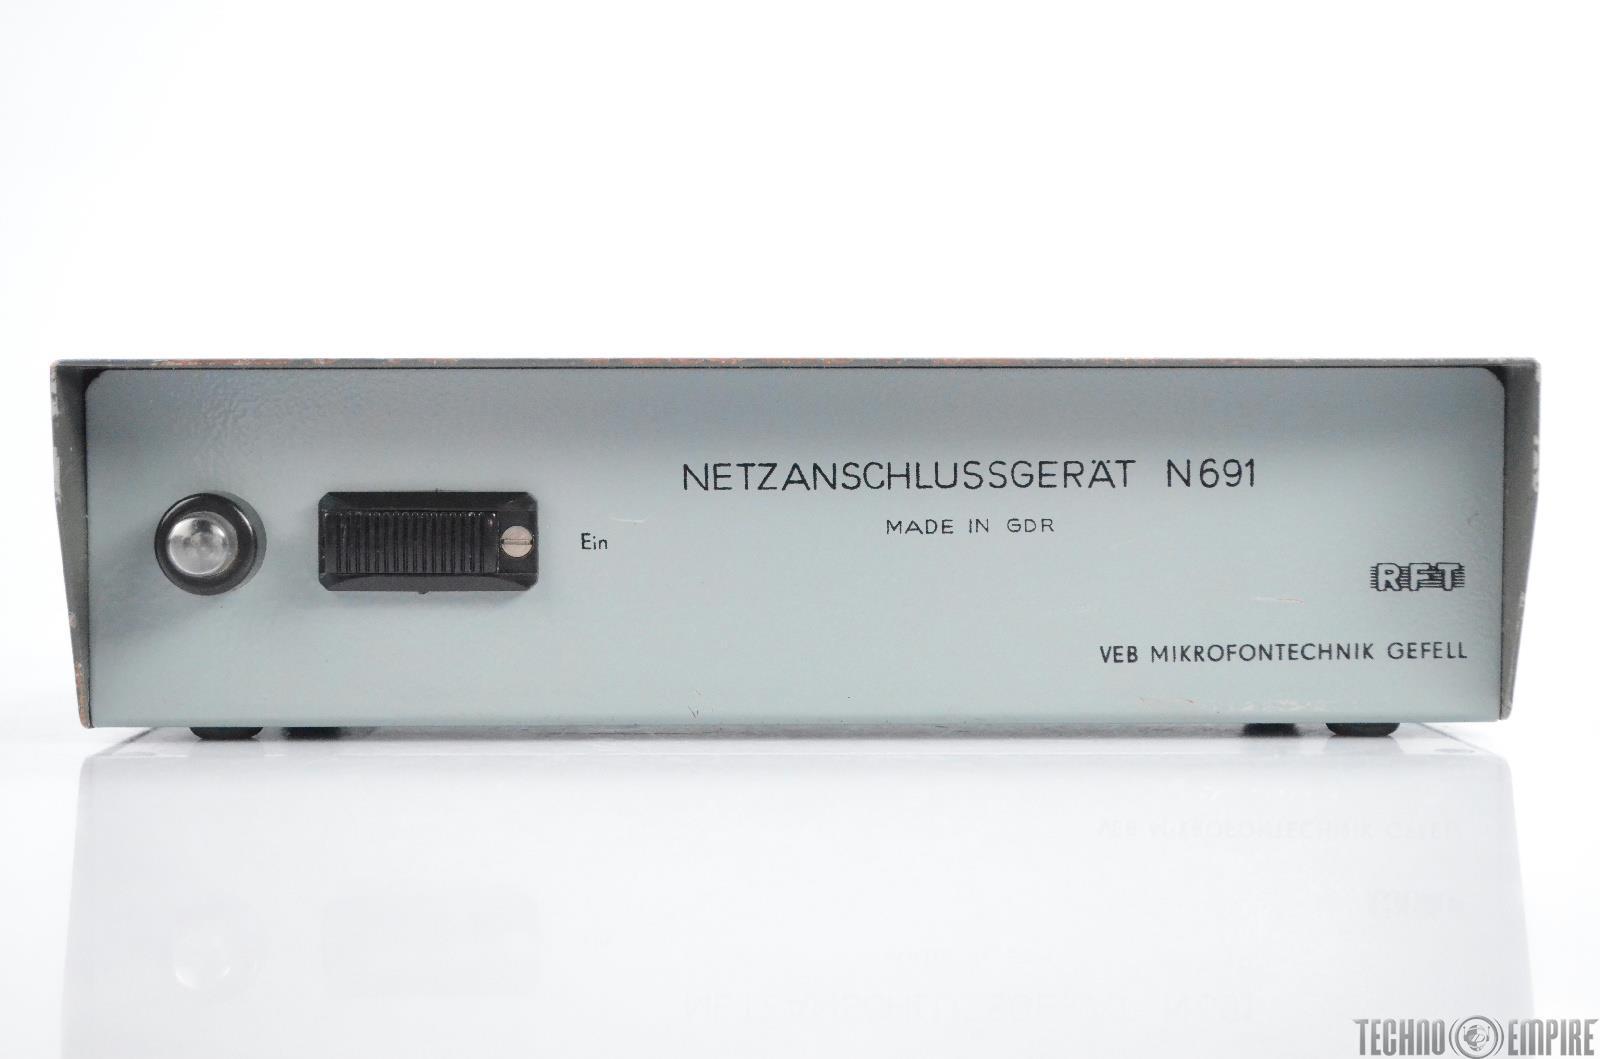 Neumann Gefell RFT N691 Microphone Mic Power Supply Netzanshlussgerat 691 #31002